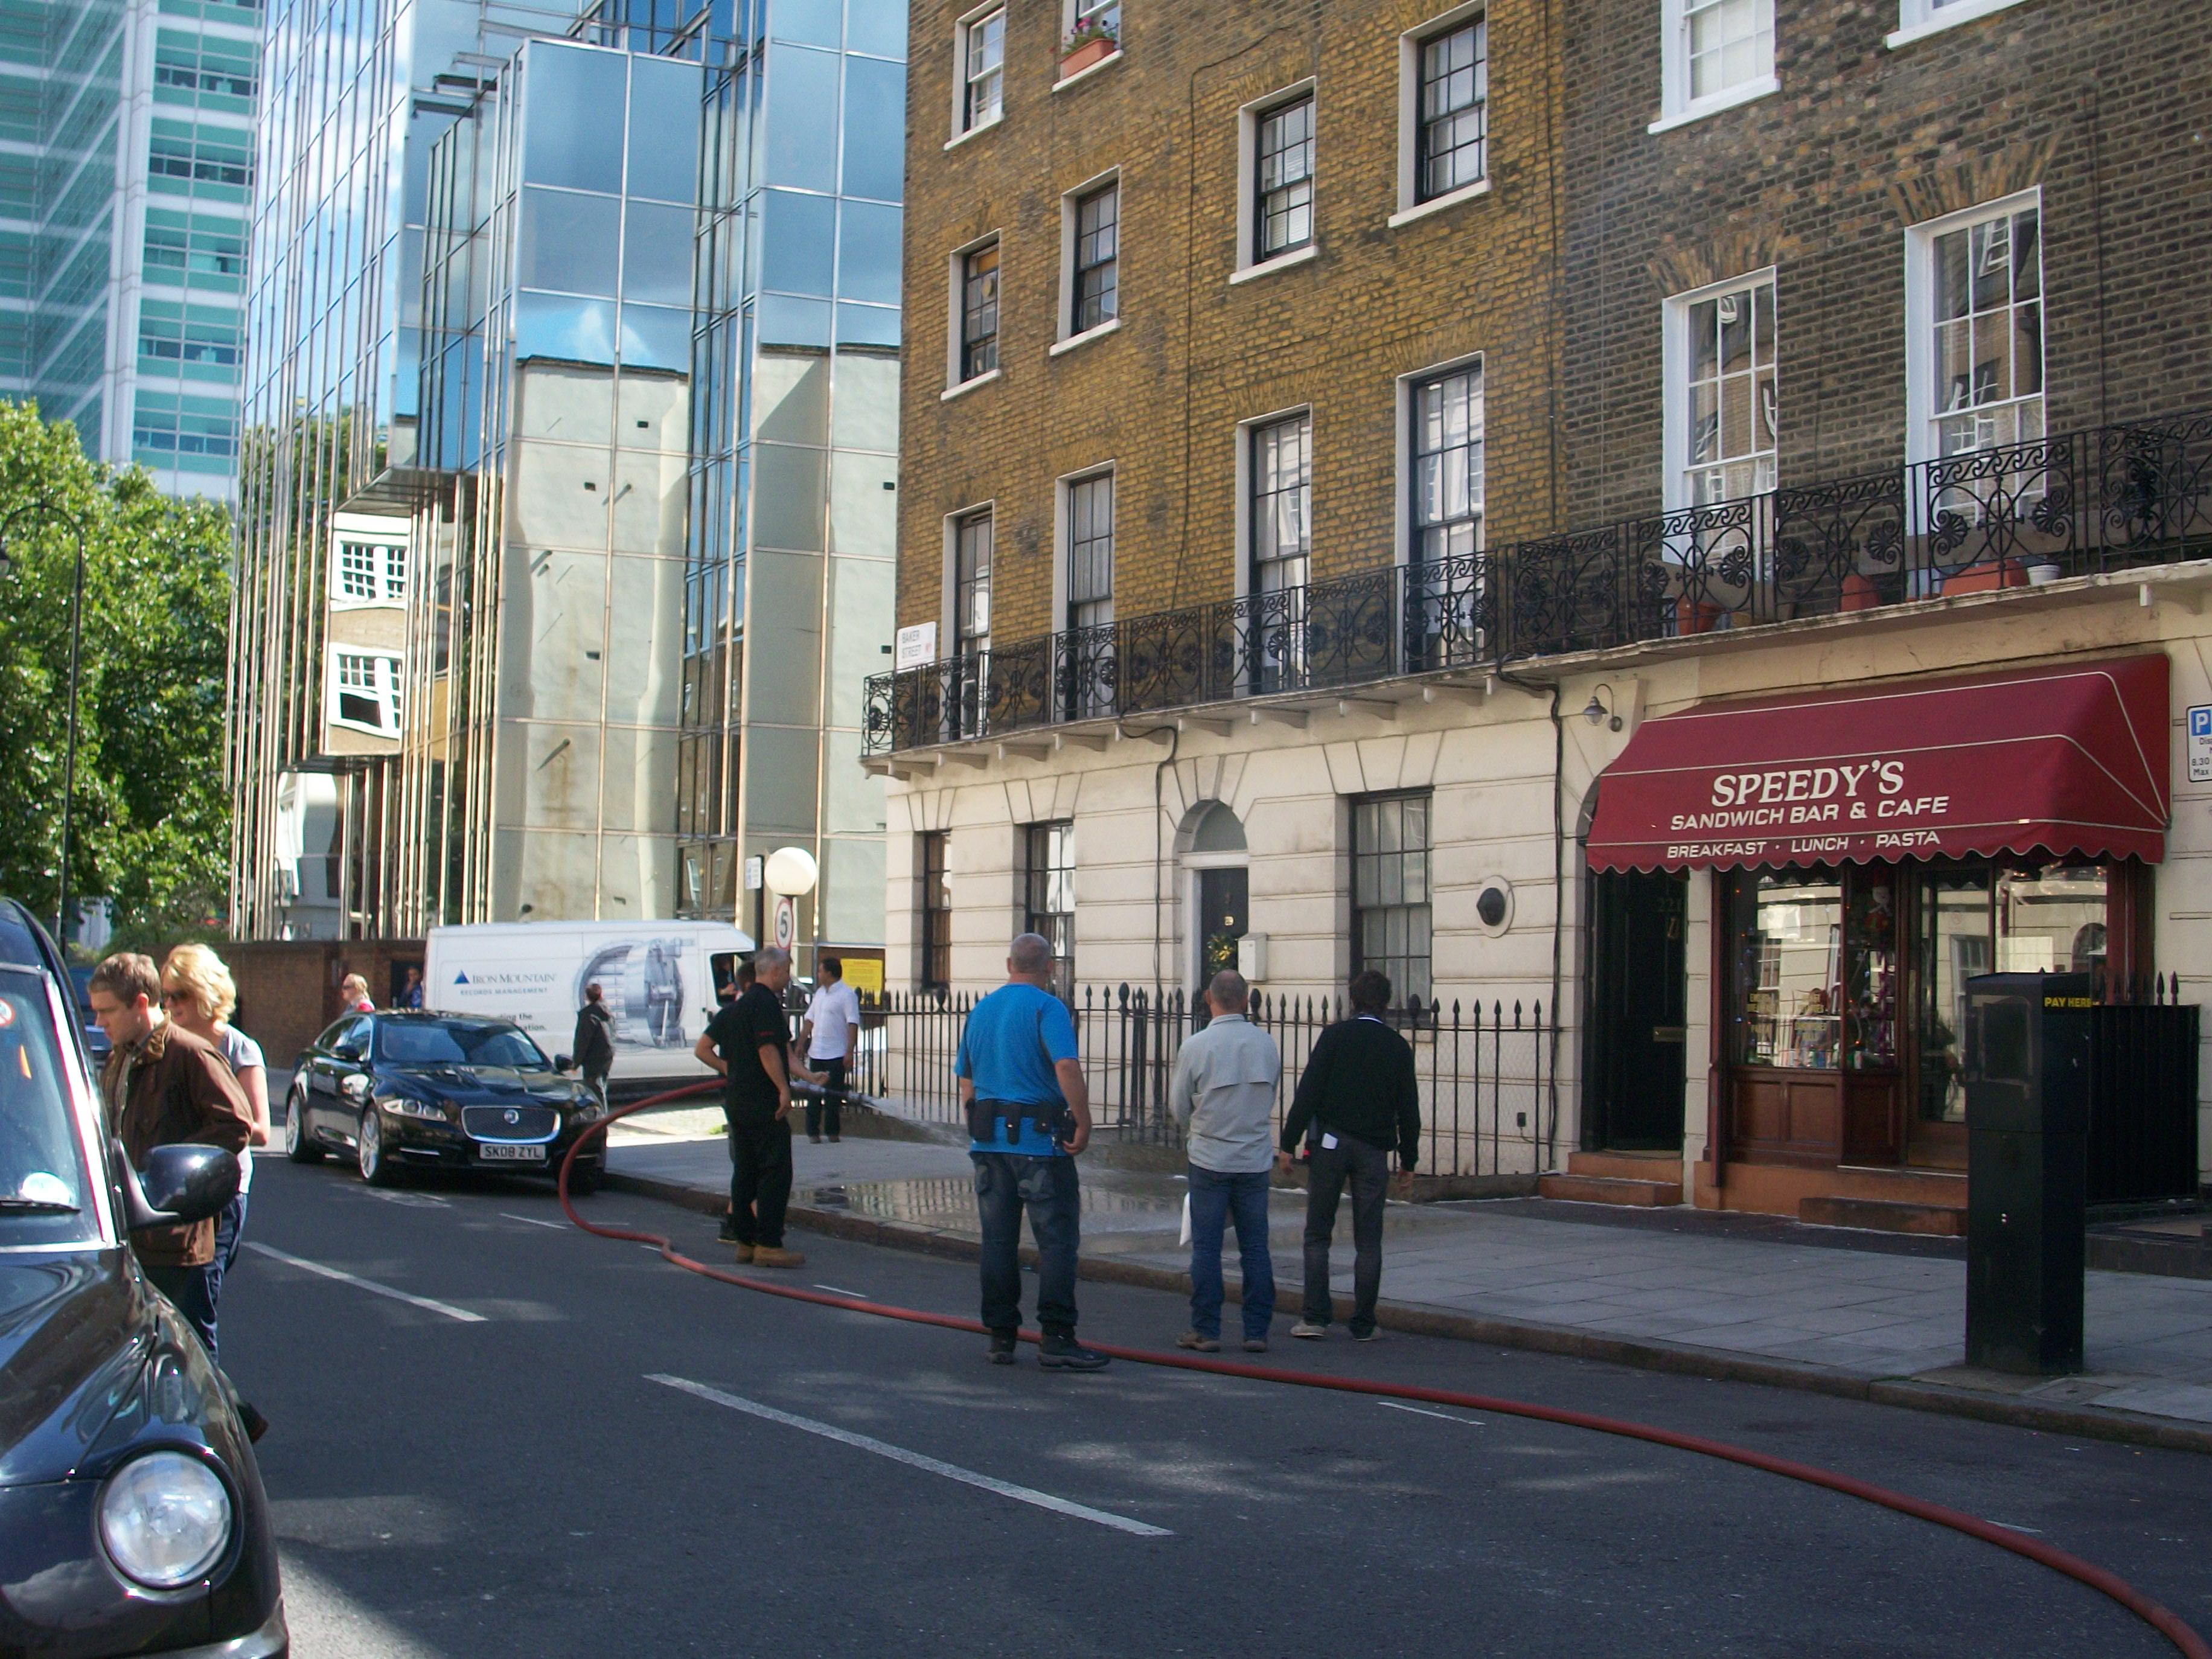 File:North Gower Street, London - Sherlock.jpg